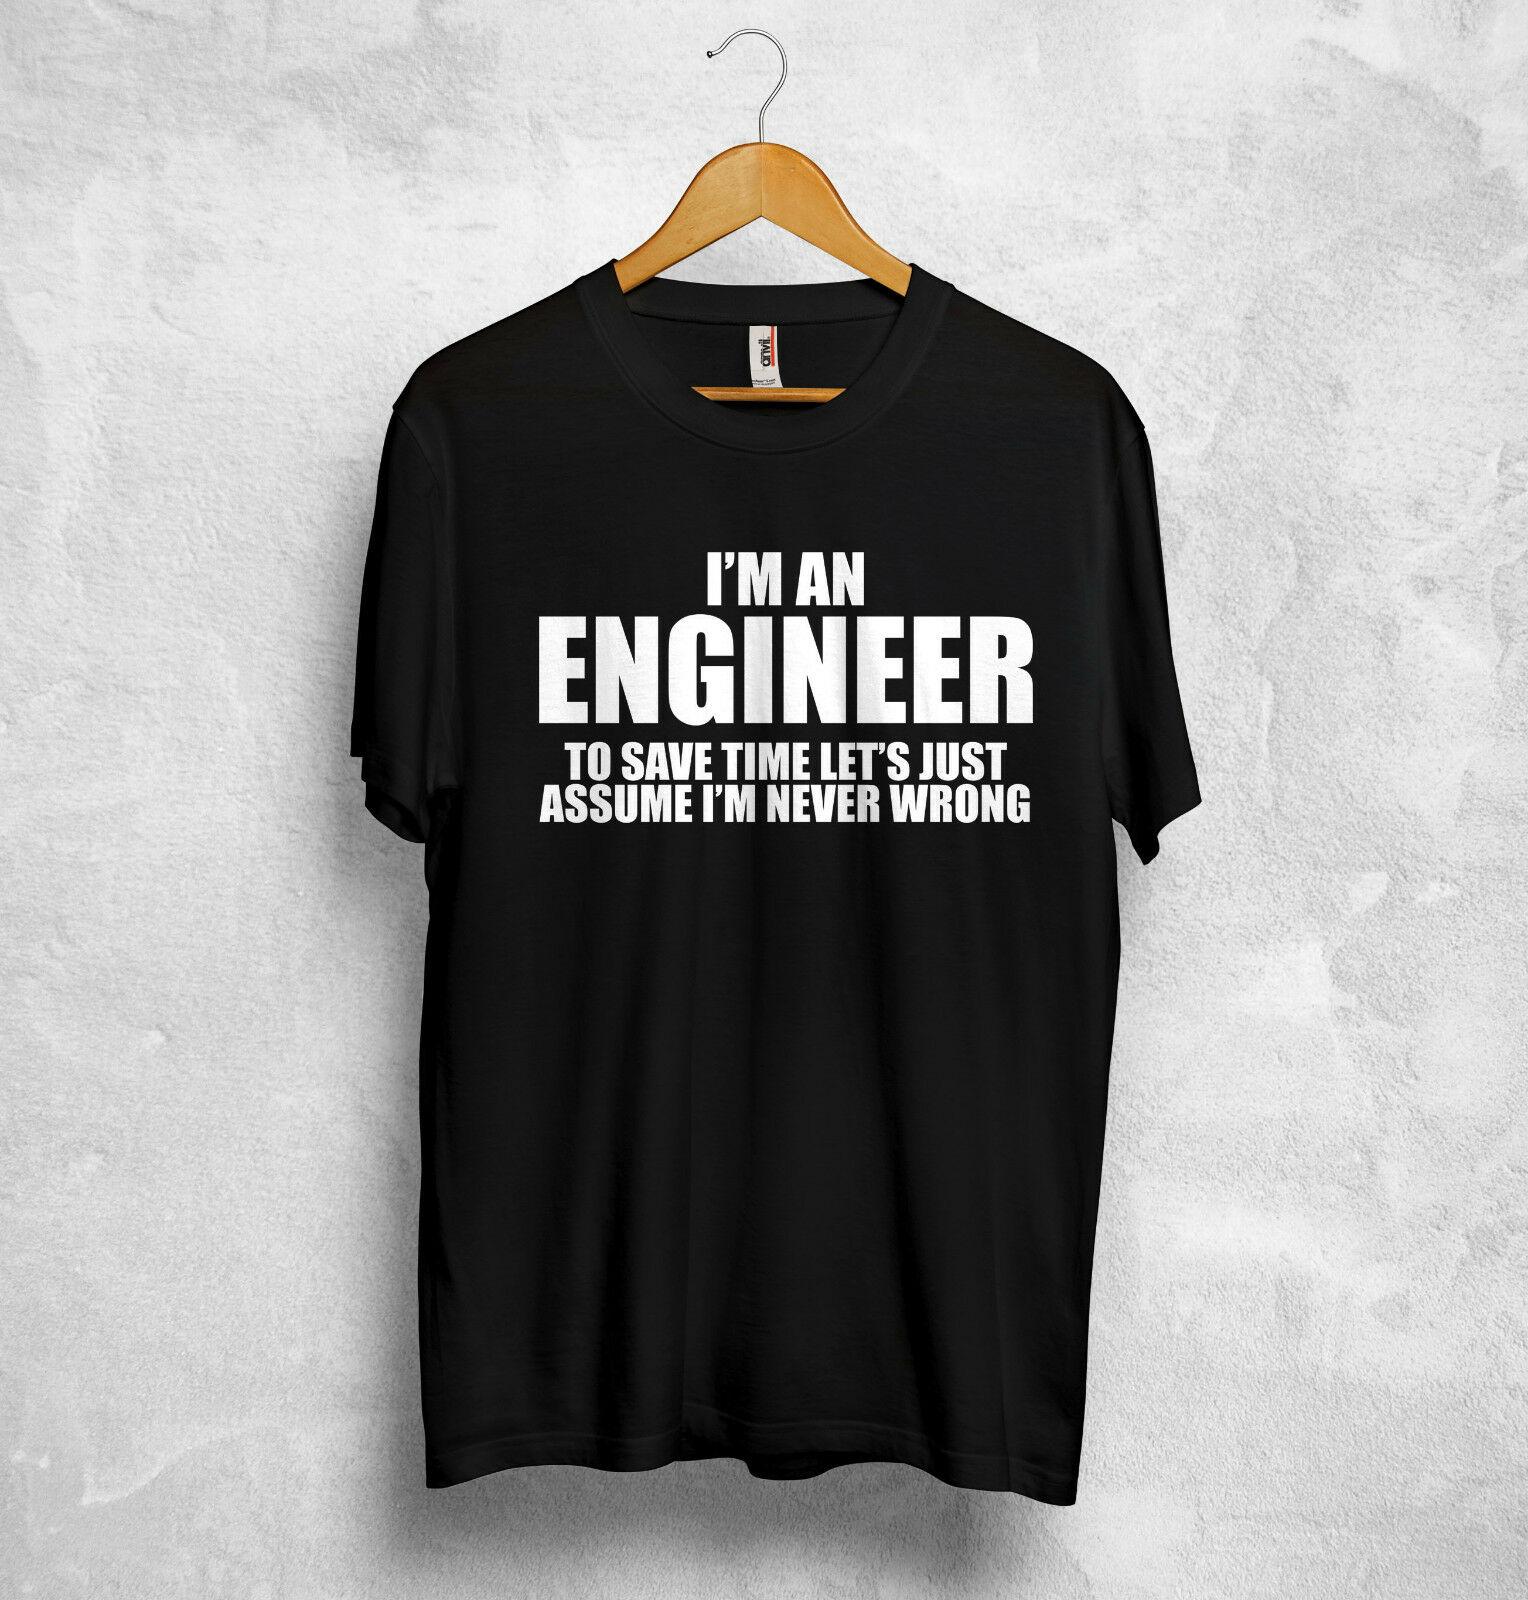 Camiseta de ingeniero Im un estudiante de ingeniero padre papá regalo de abuelo mecánico